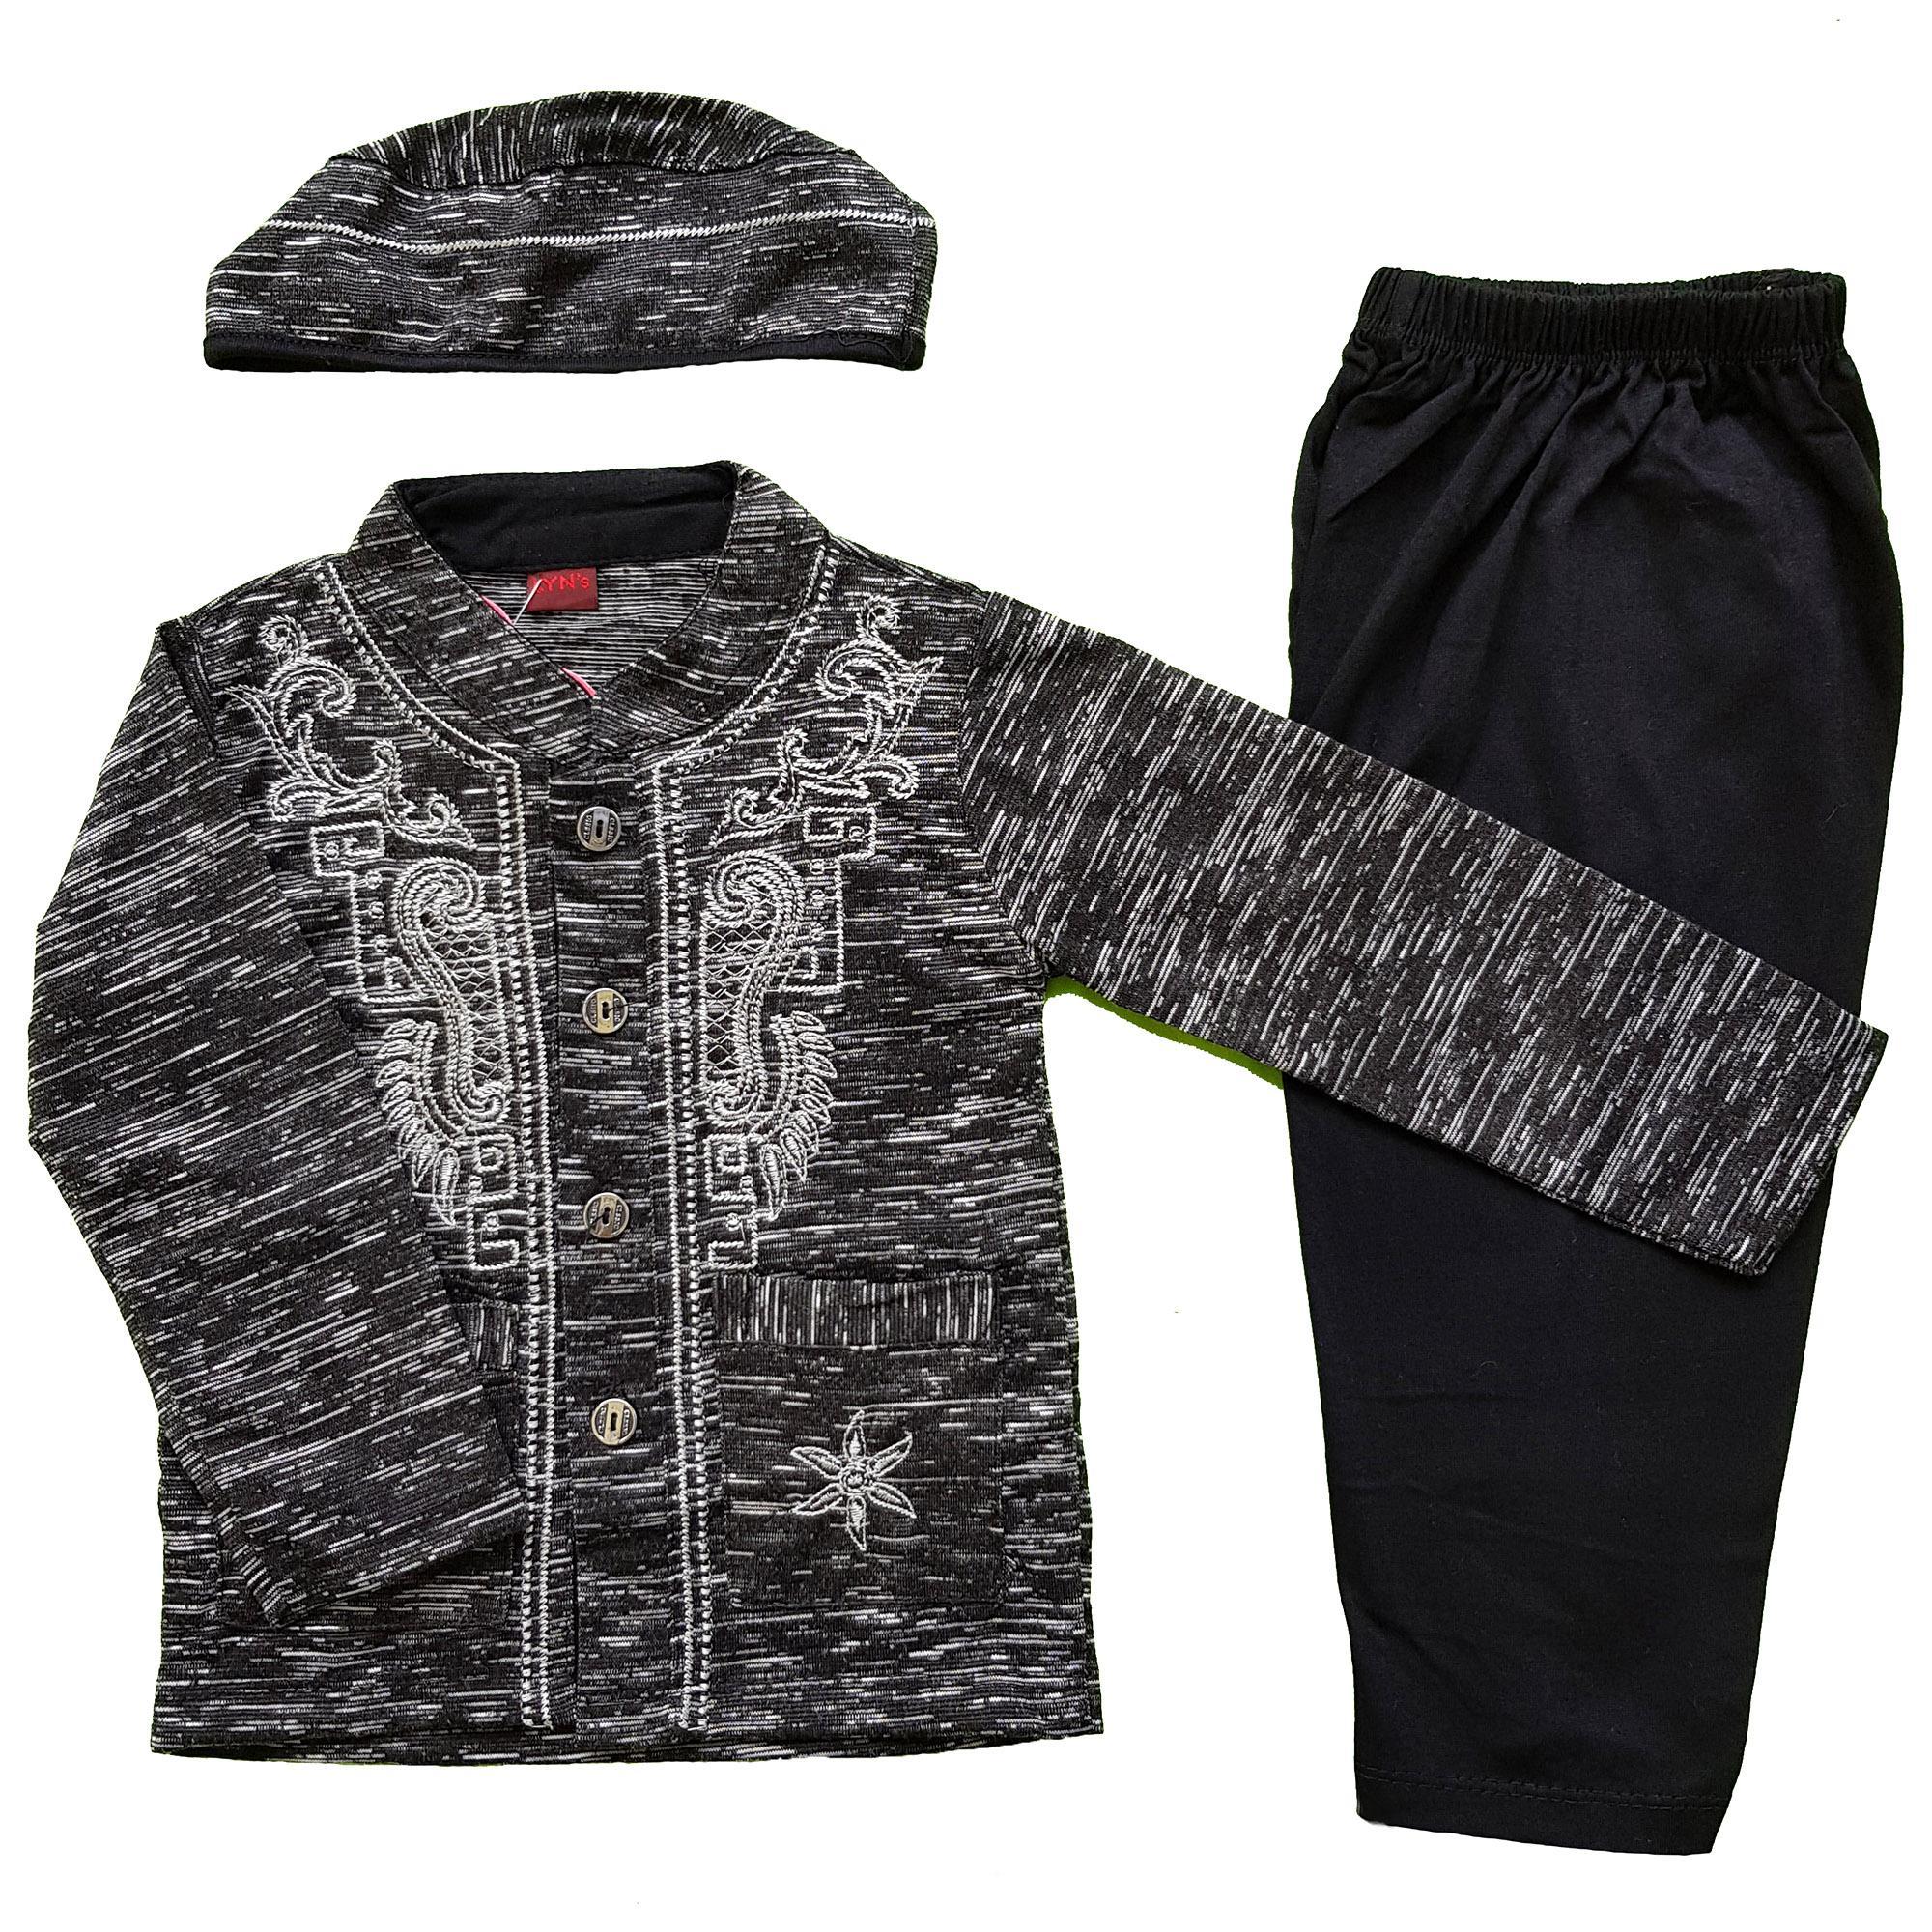 Baju Muslim Koko (0-10 Bulan) Anak Bayi Laki-Laki Setelan Set Peci LY2